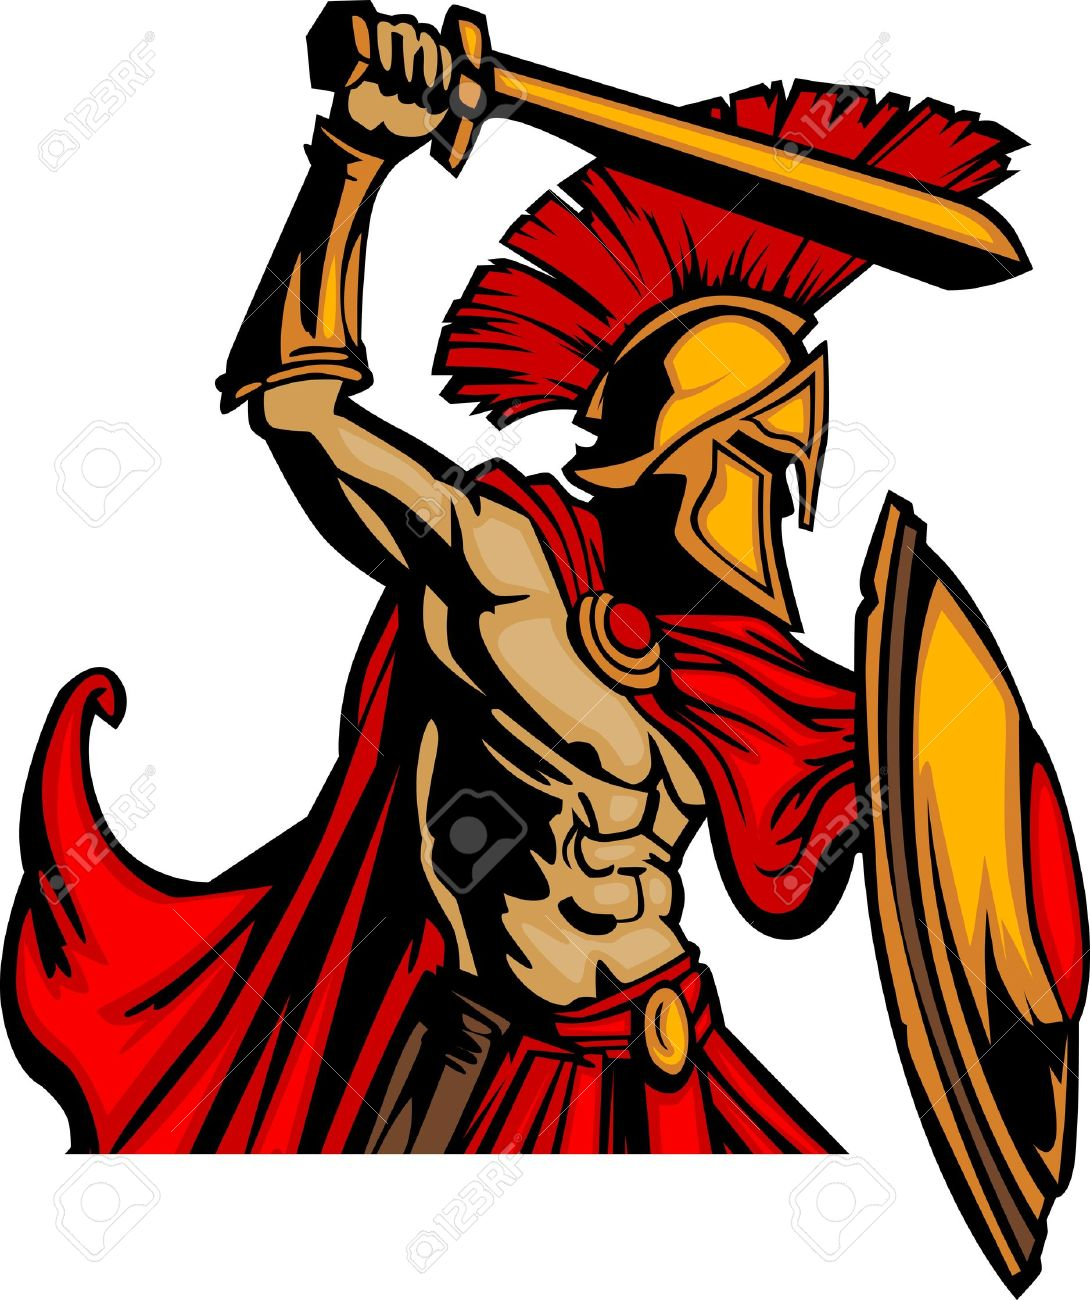 Warrior Clipart & Warrior Clip Art Images.